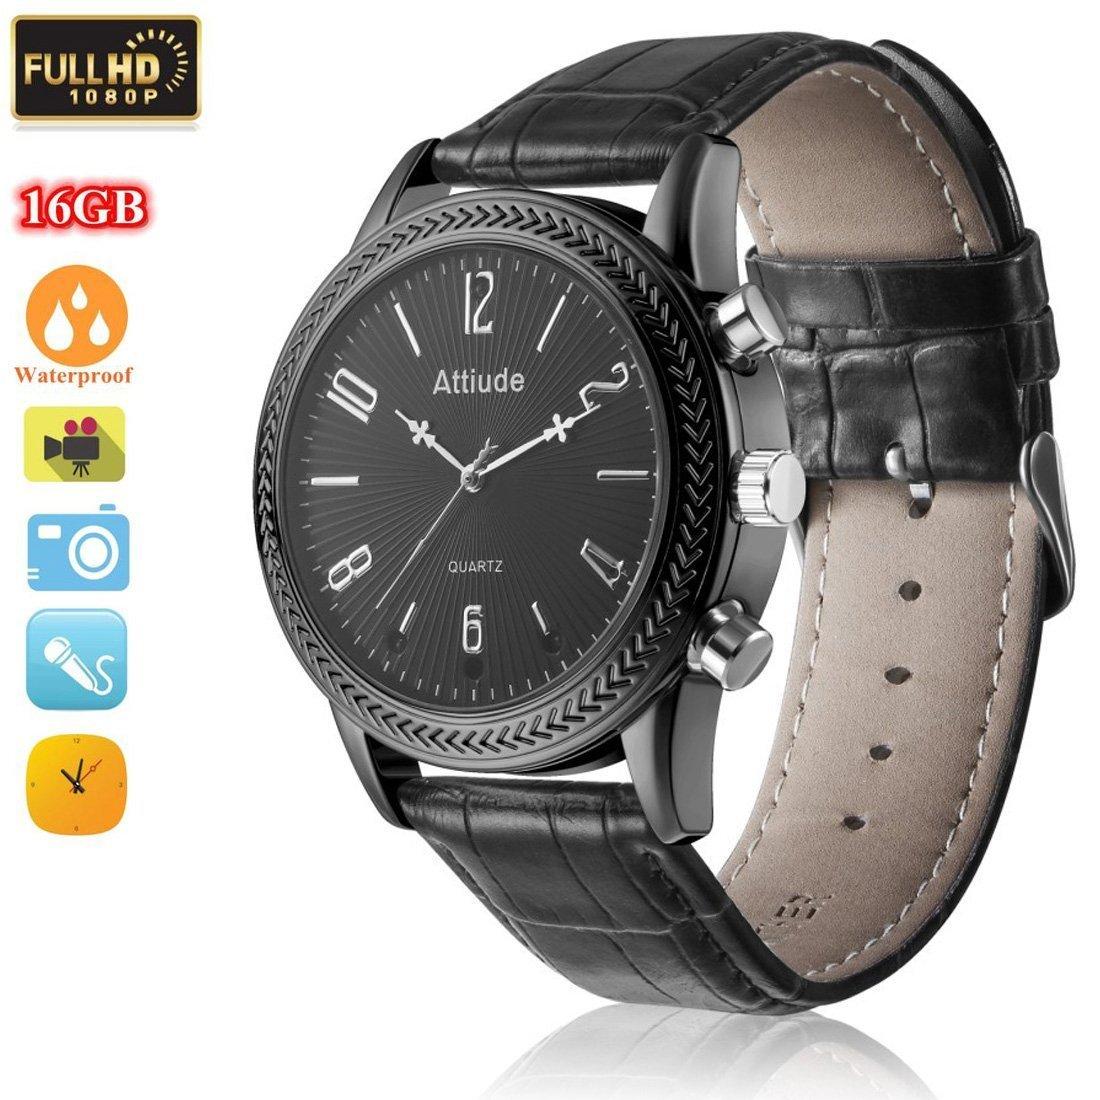 MIEBUL 16GB Wrist Smart Watch Camera HD 1080P Infrared Night Vision High-end Camera(Black) by MIEBUL